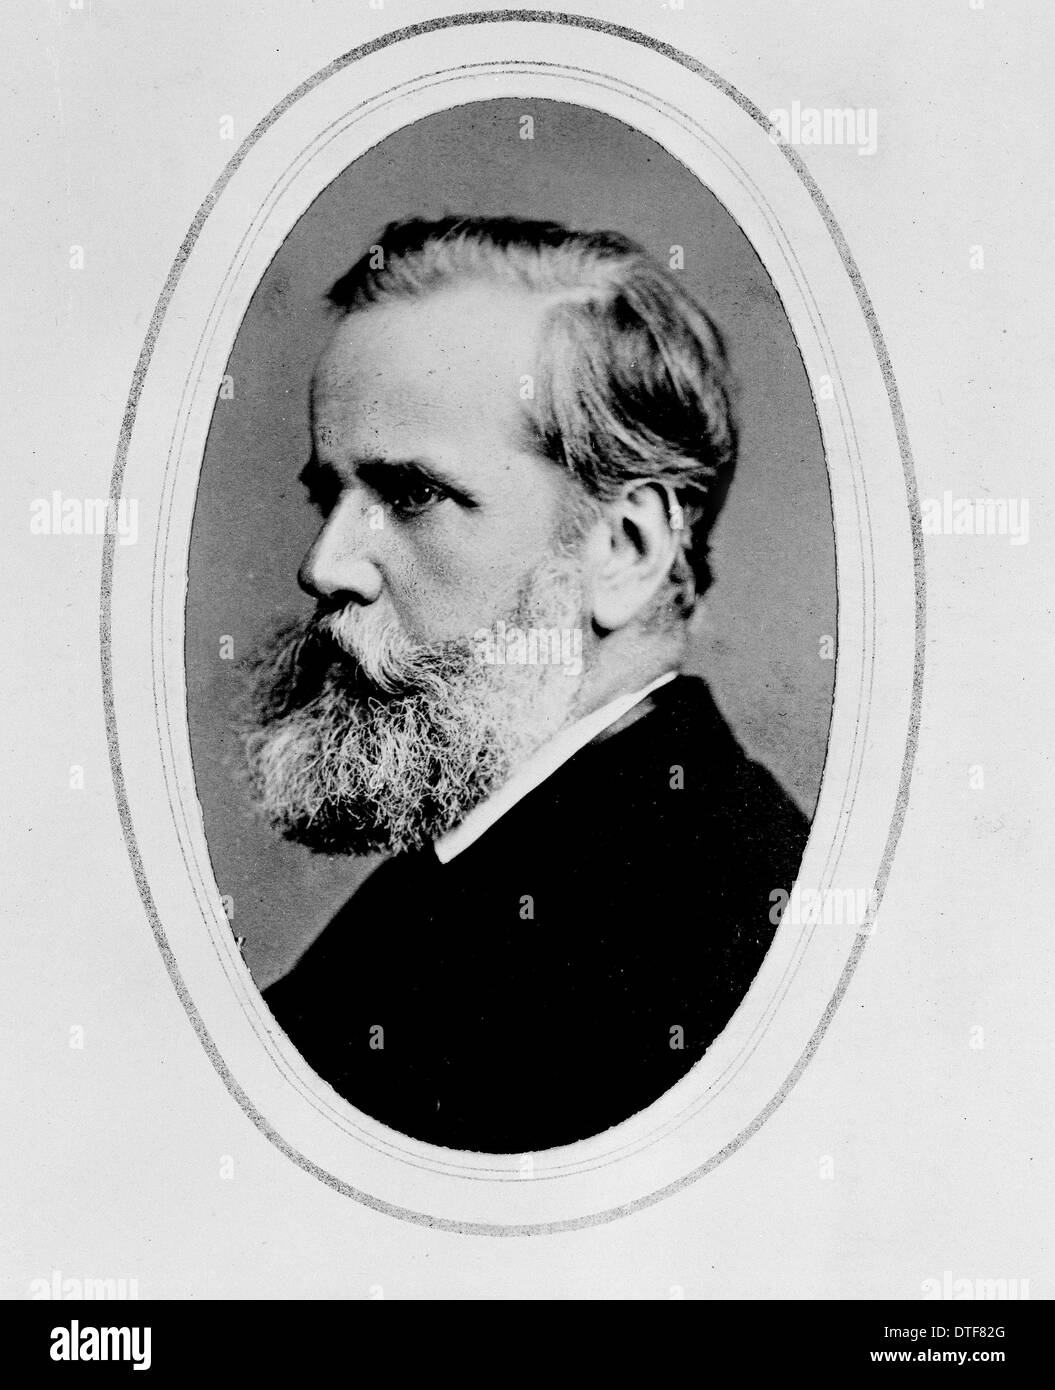 Dom Pedro II, Emperor of Brazil (1825-1891) Stock Photo